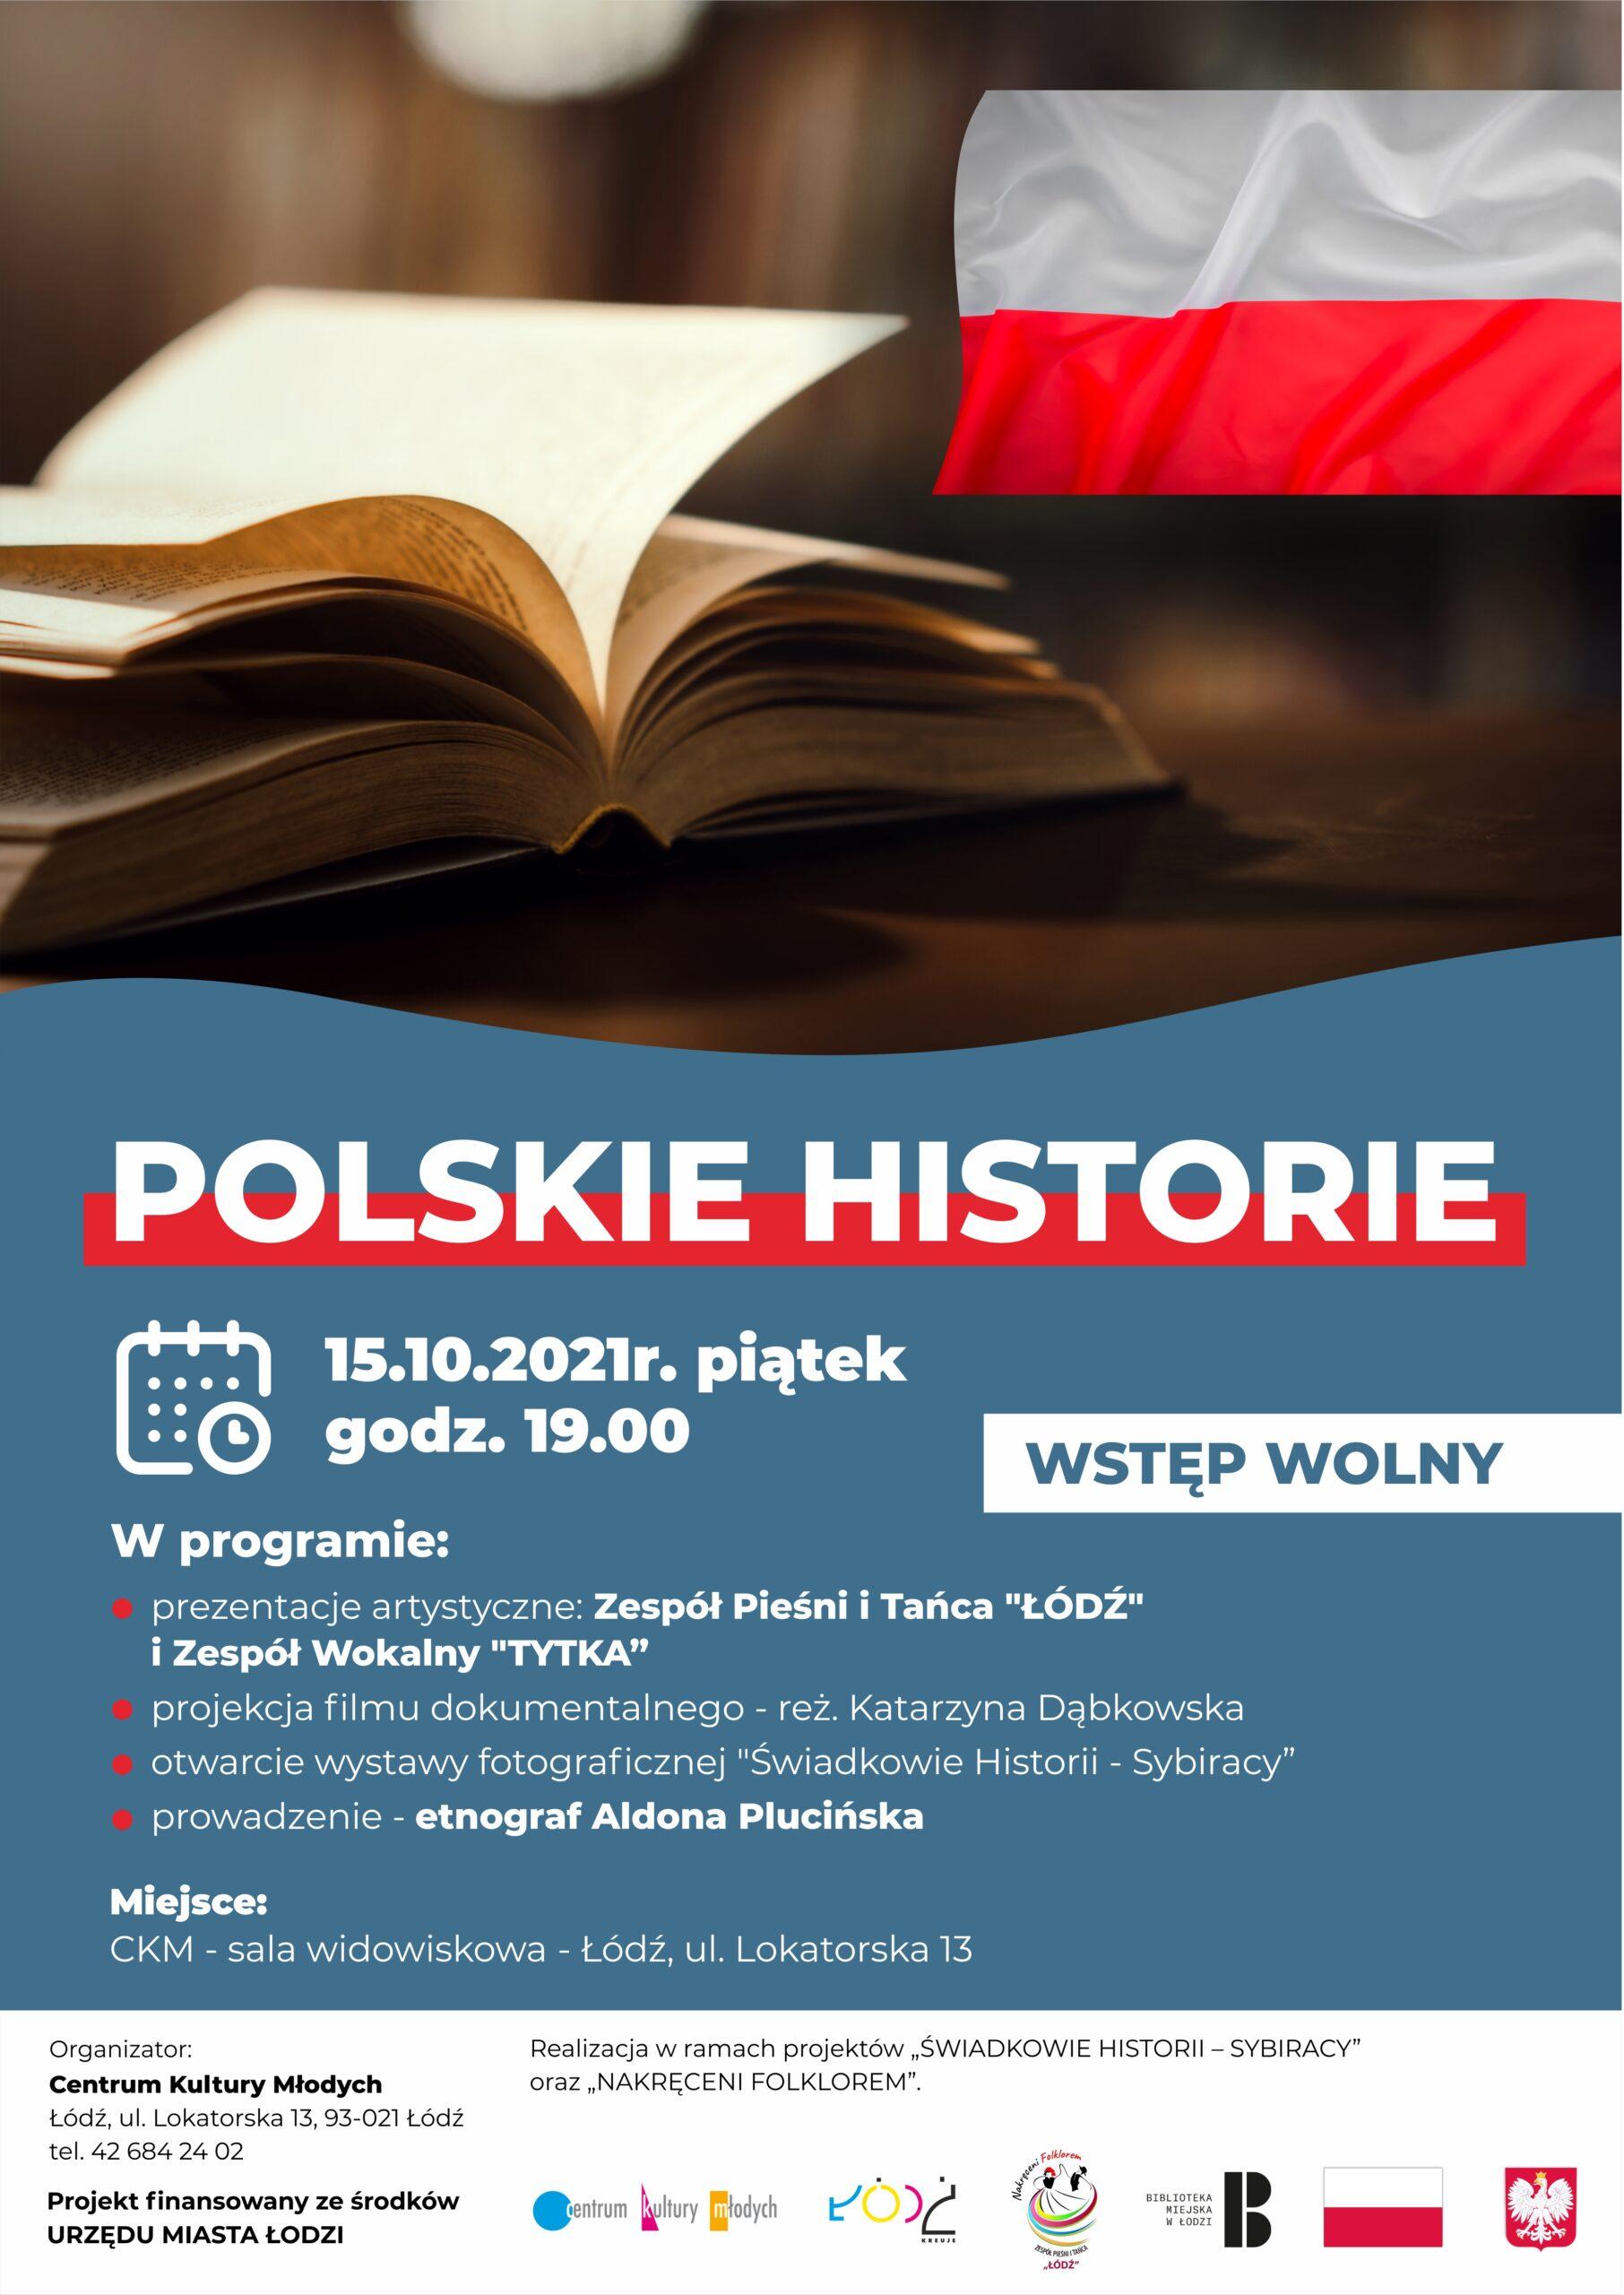 Polskie historie - plakat